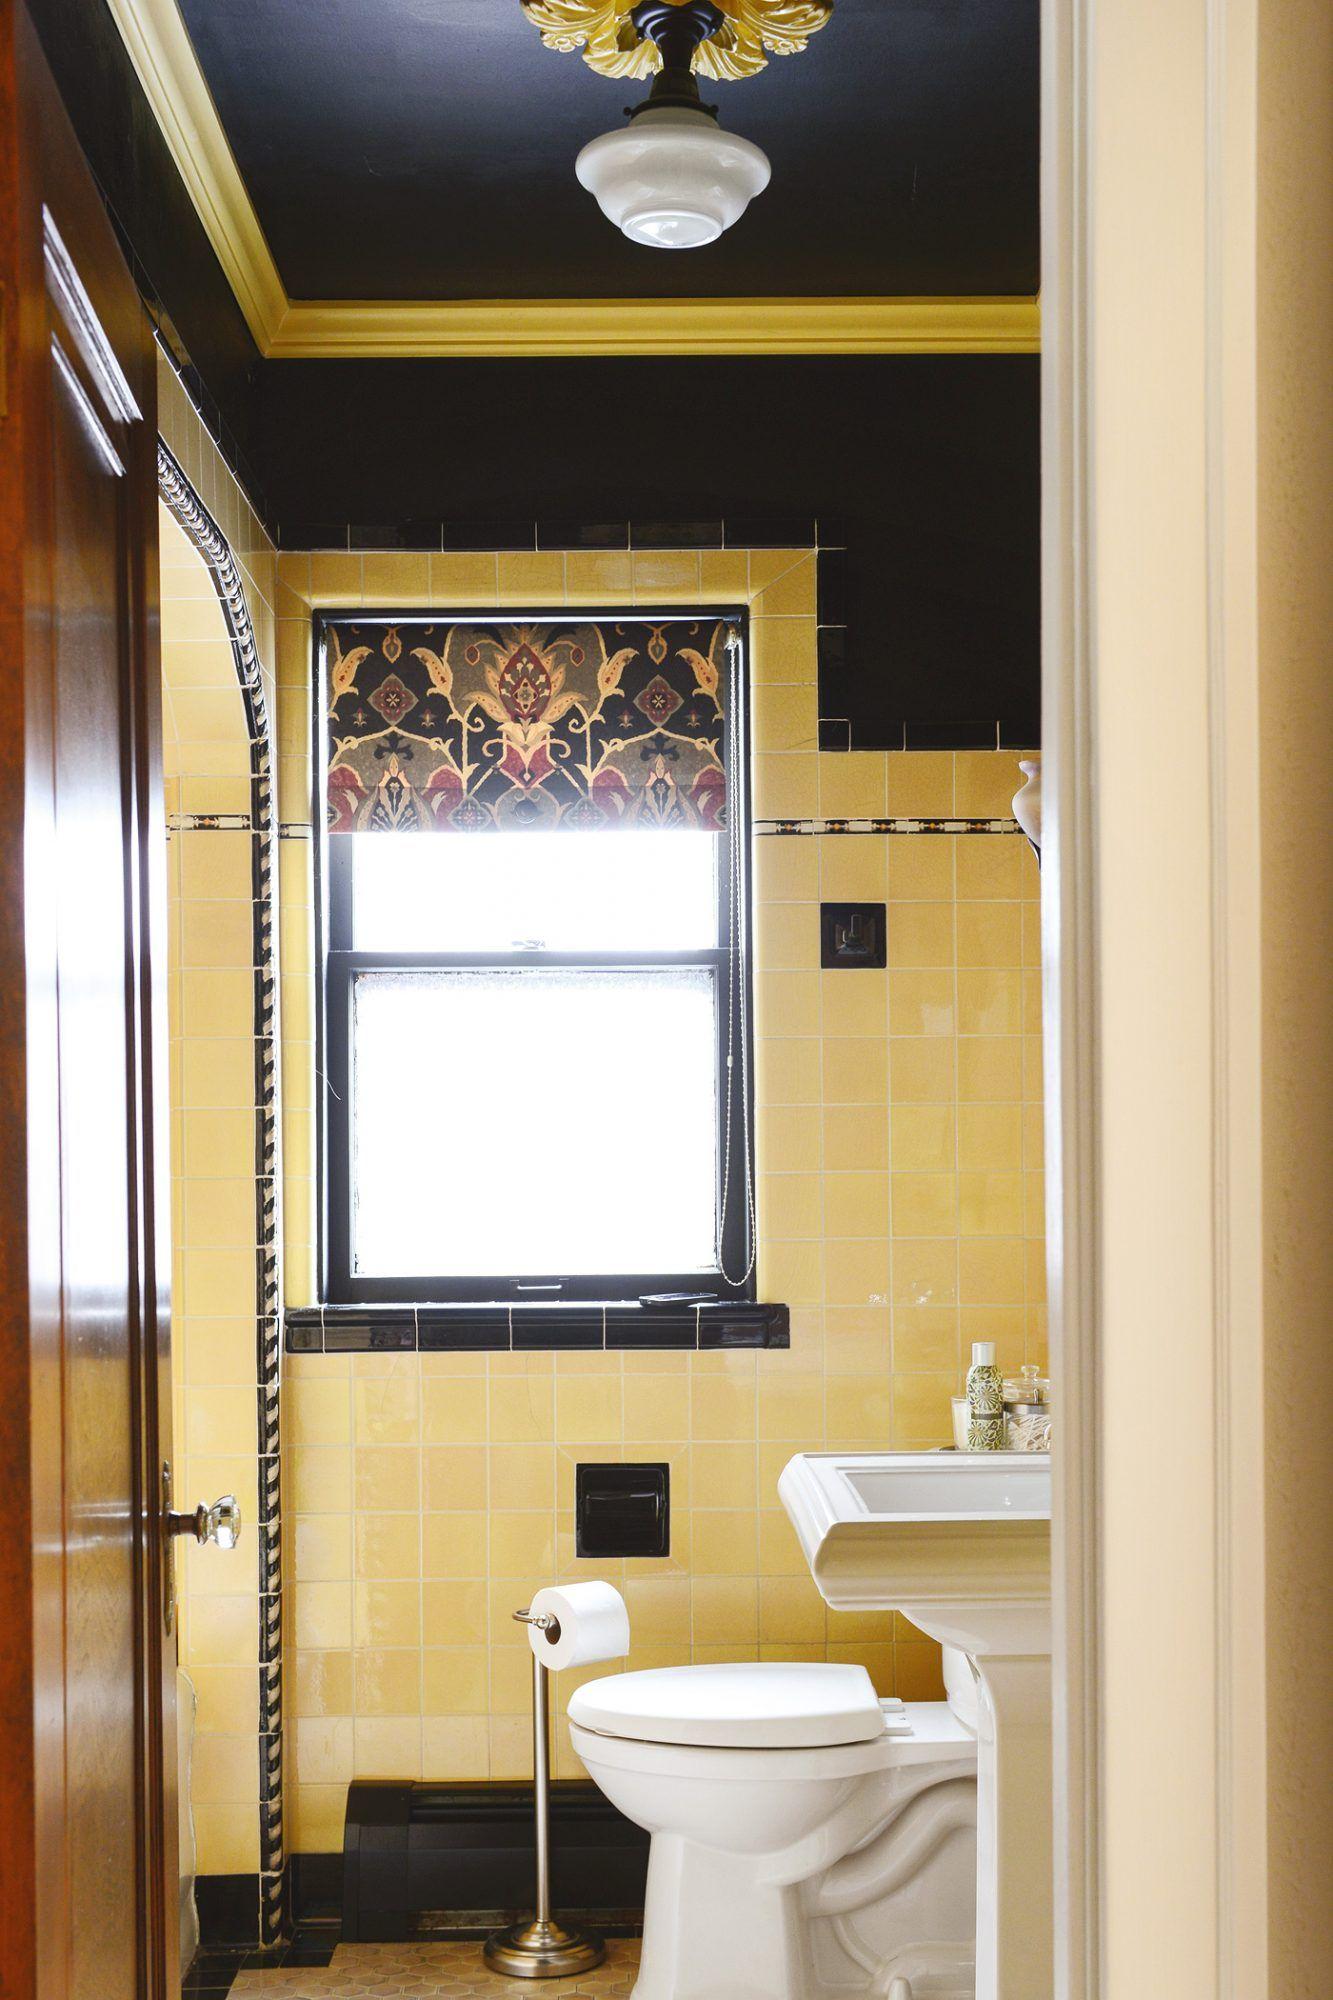 How To Refresh A Vintage Bathroom Keep The Charm I Of Ii Yellow Bathrooms Yellow Bathroom Tiles Vintage Bathroom